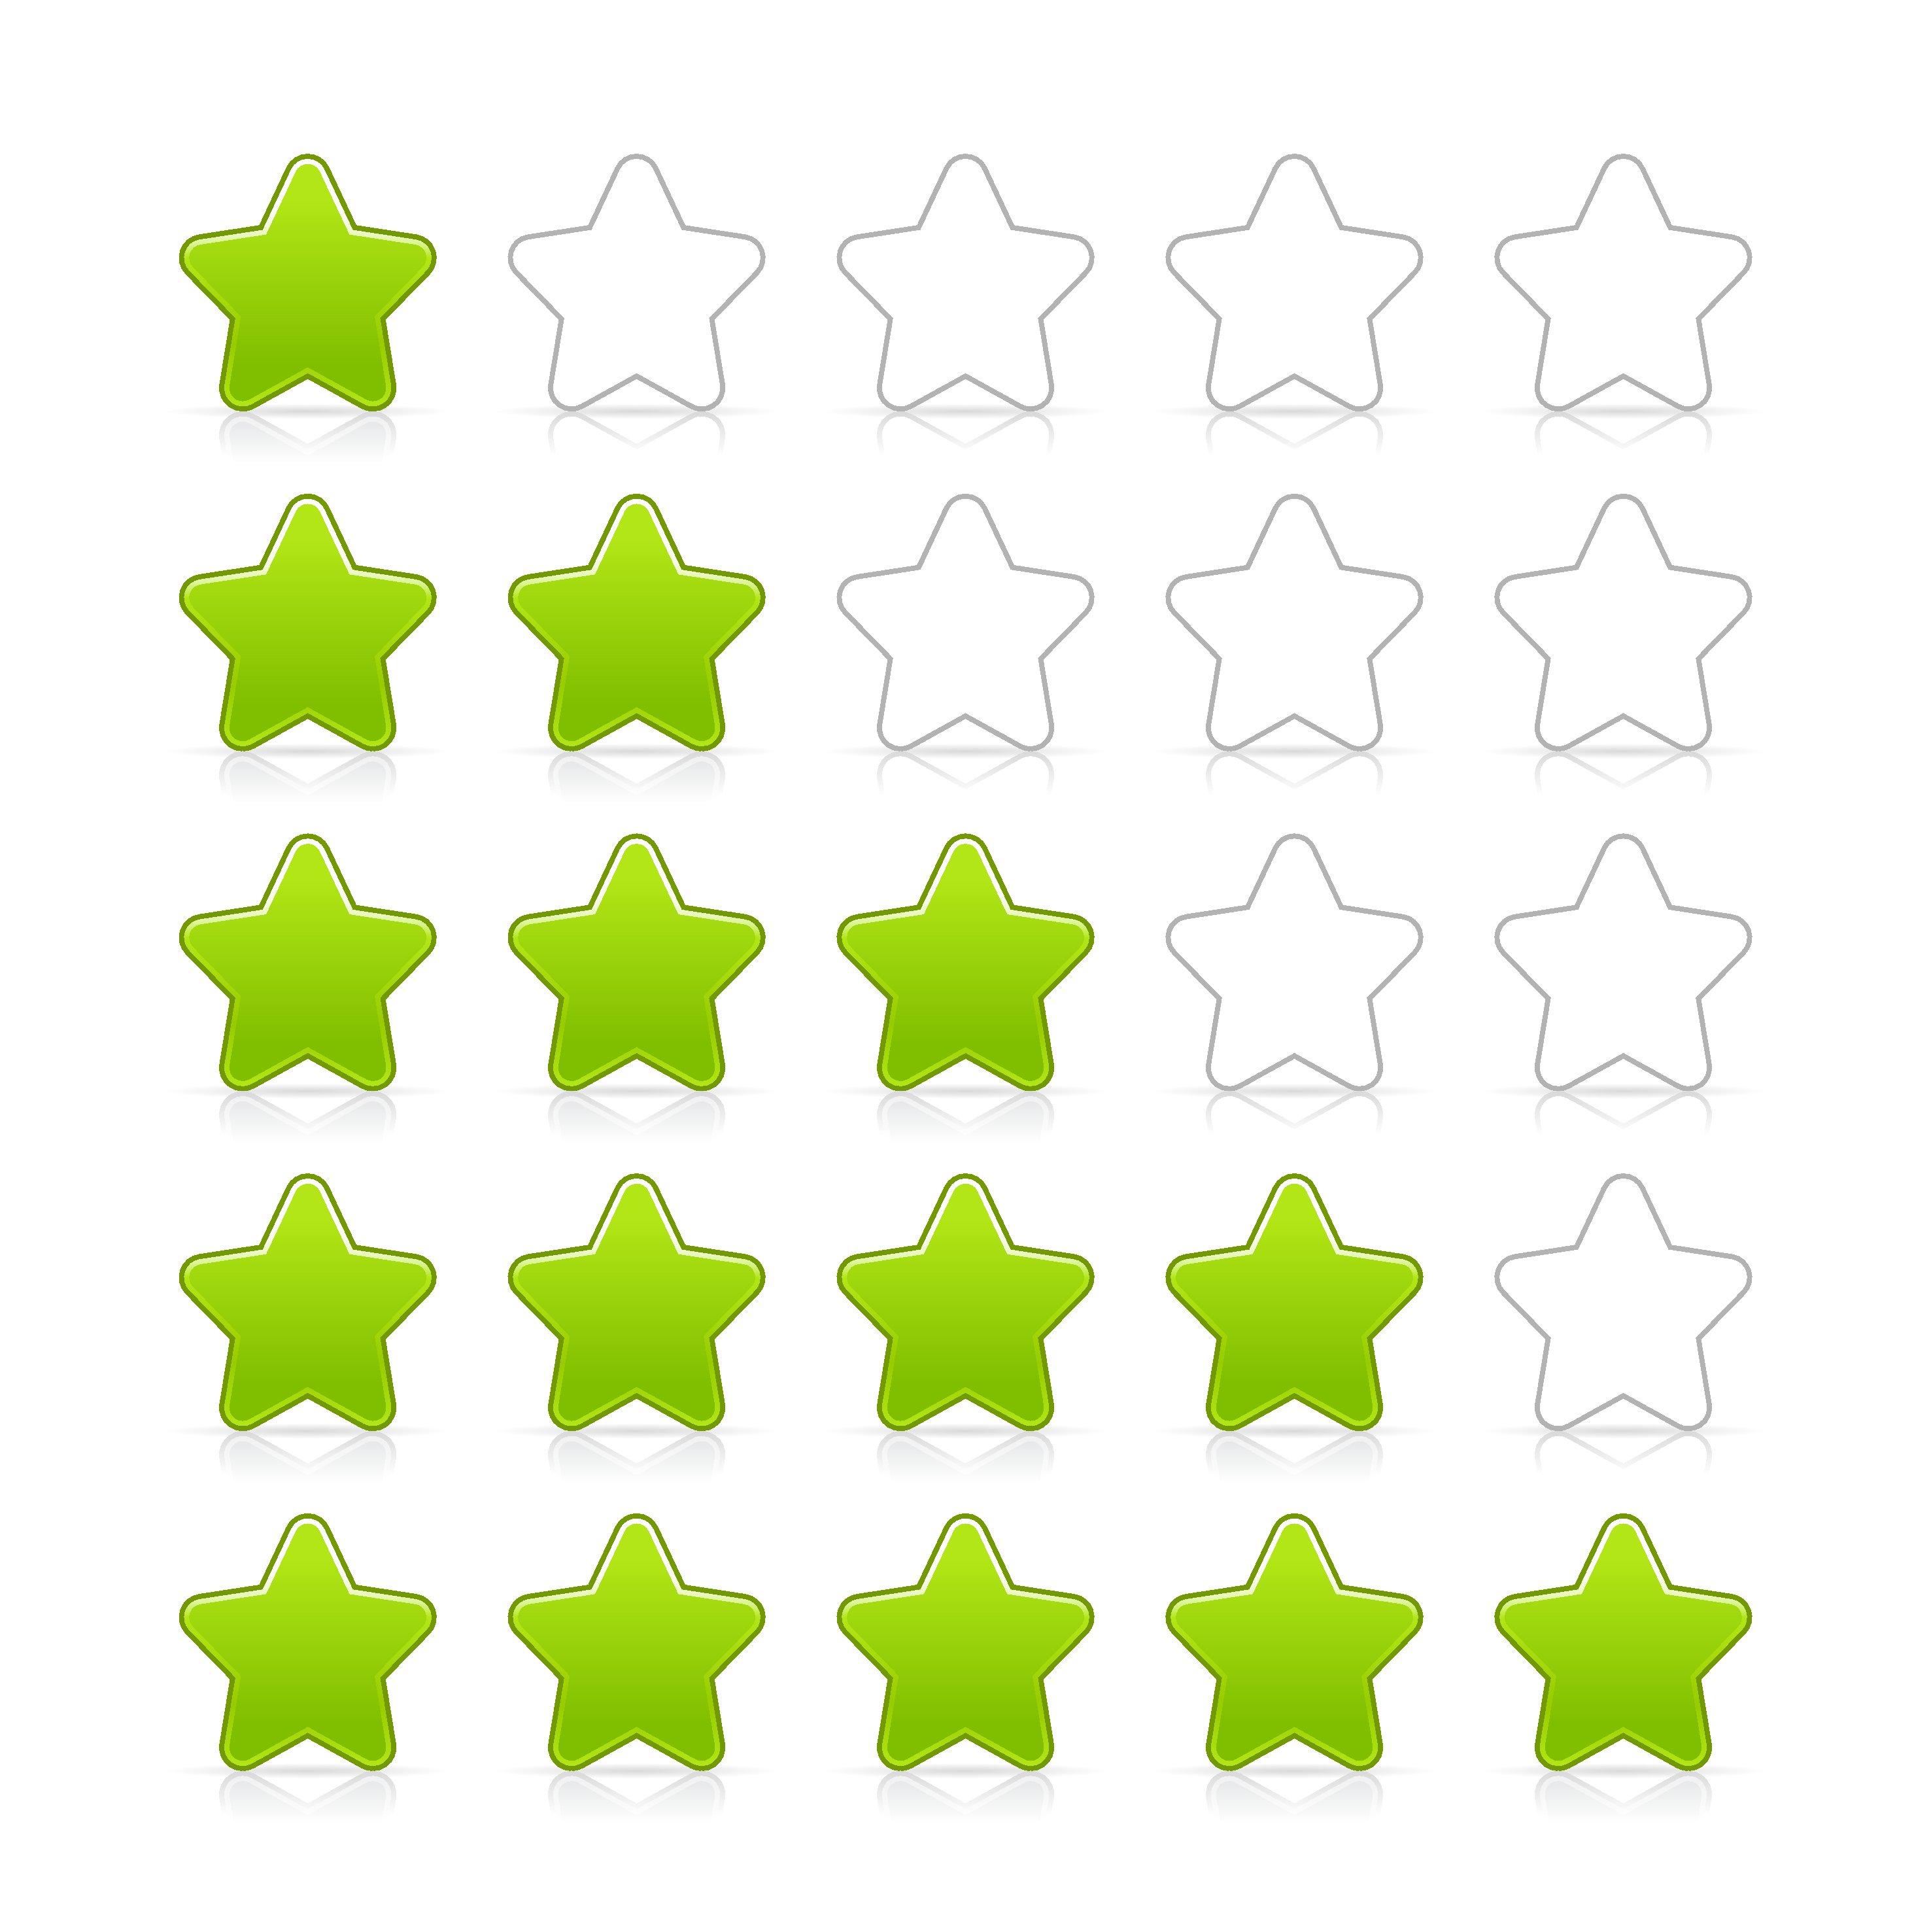 http://www.gfi.com/blog/wp-content/uploads/2010/08/review-stars.jpg